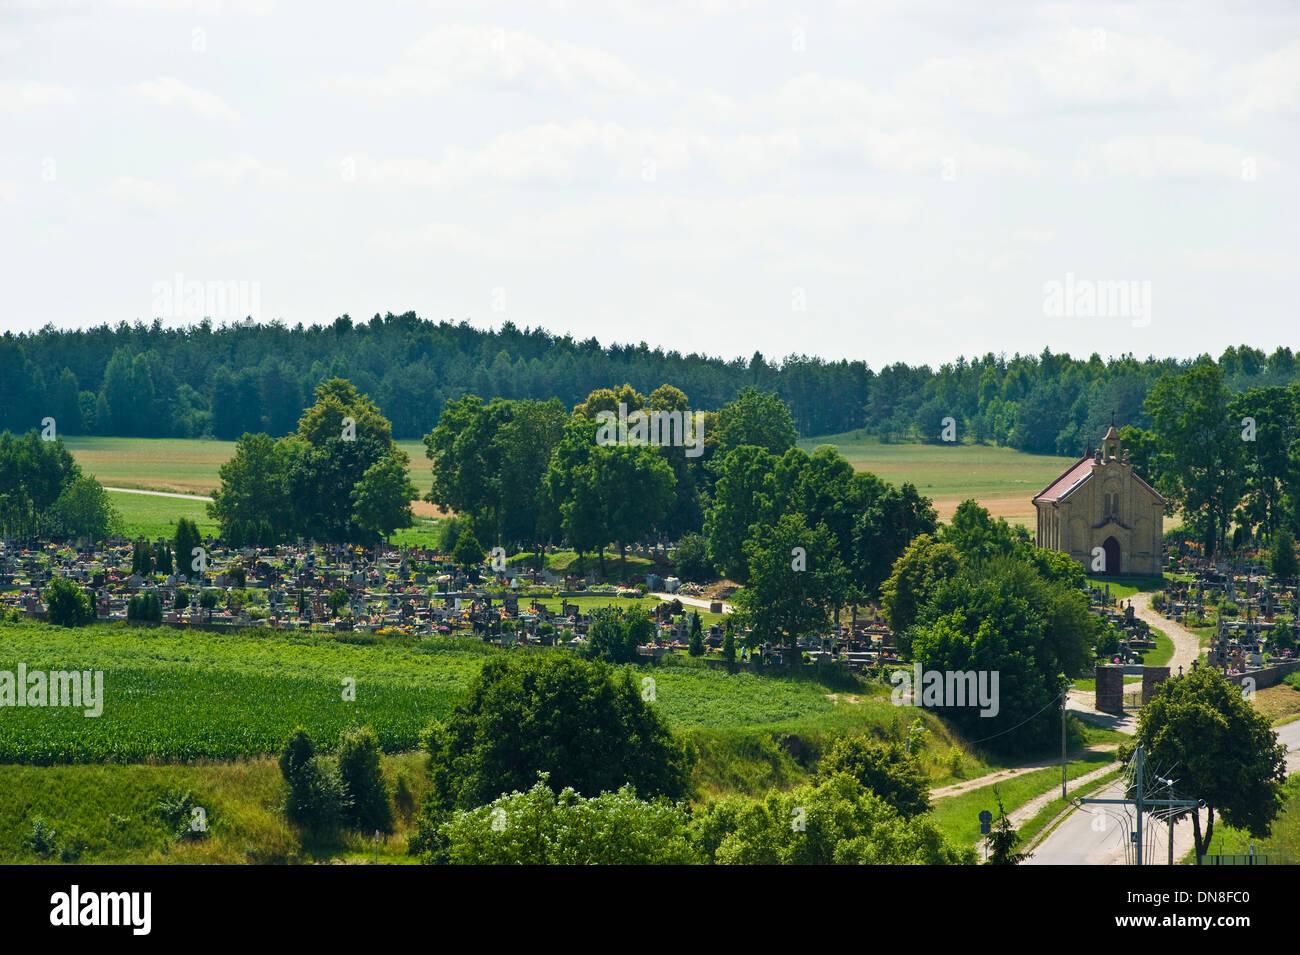 The cemetery in Goniadz, Podlaskie Voivodship, Poland. - Stock Image